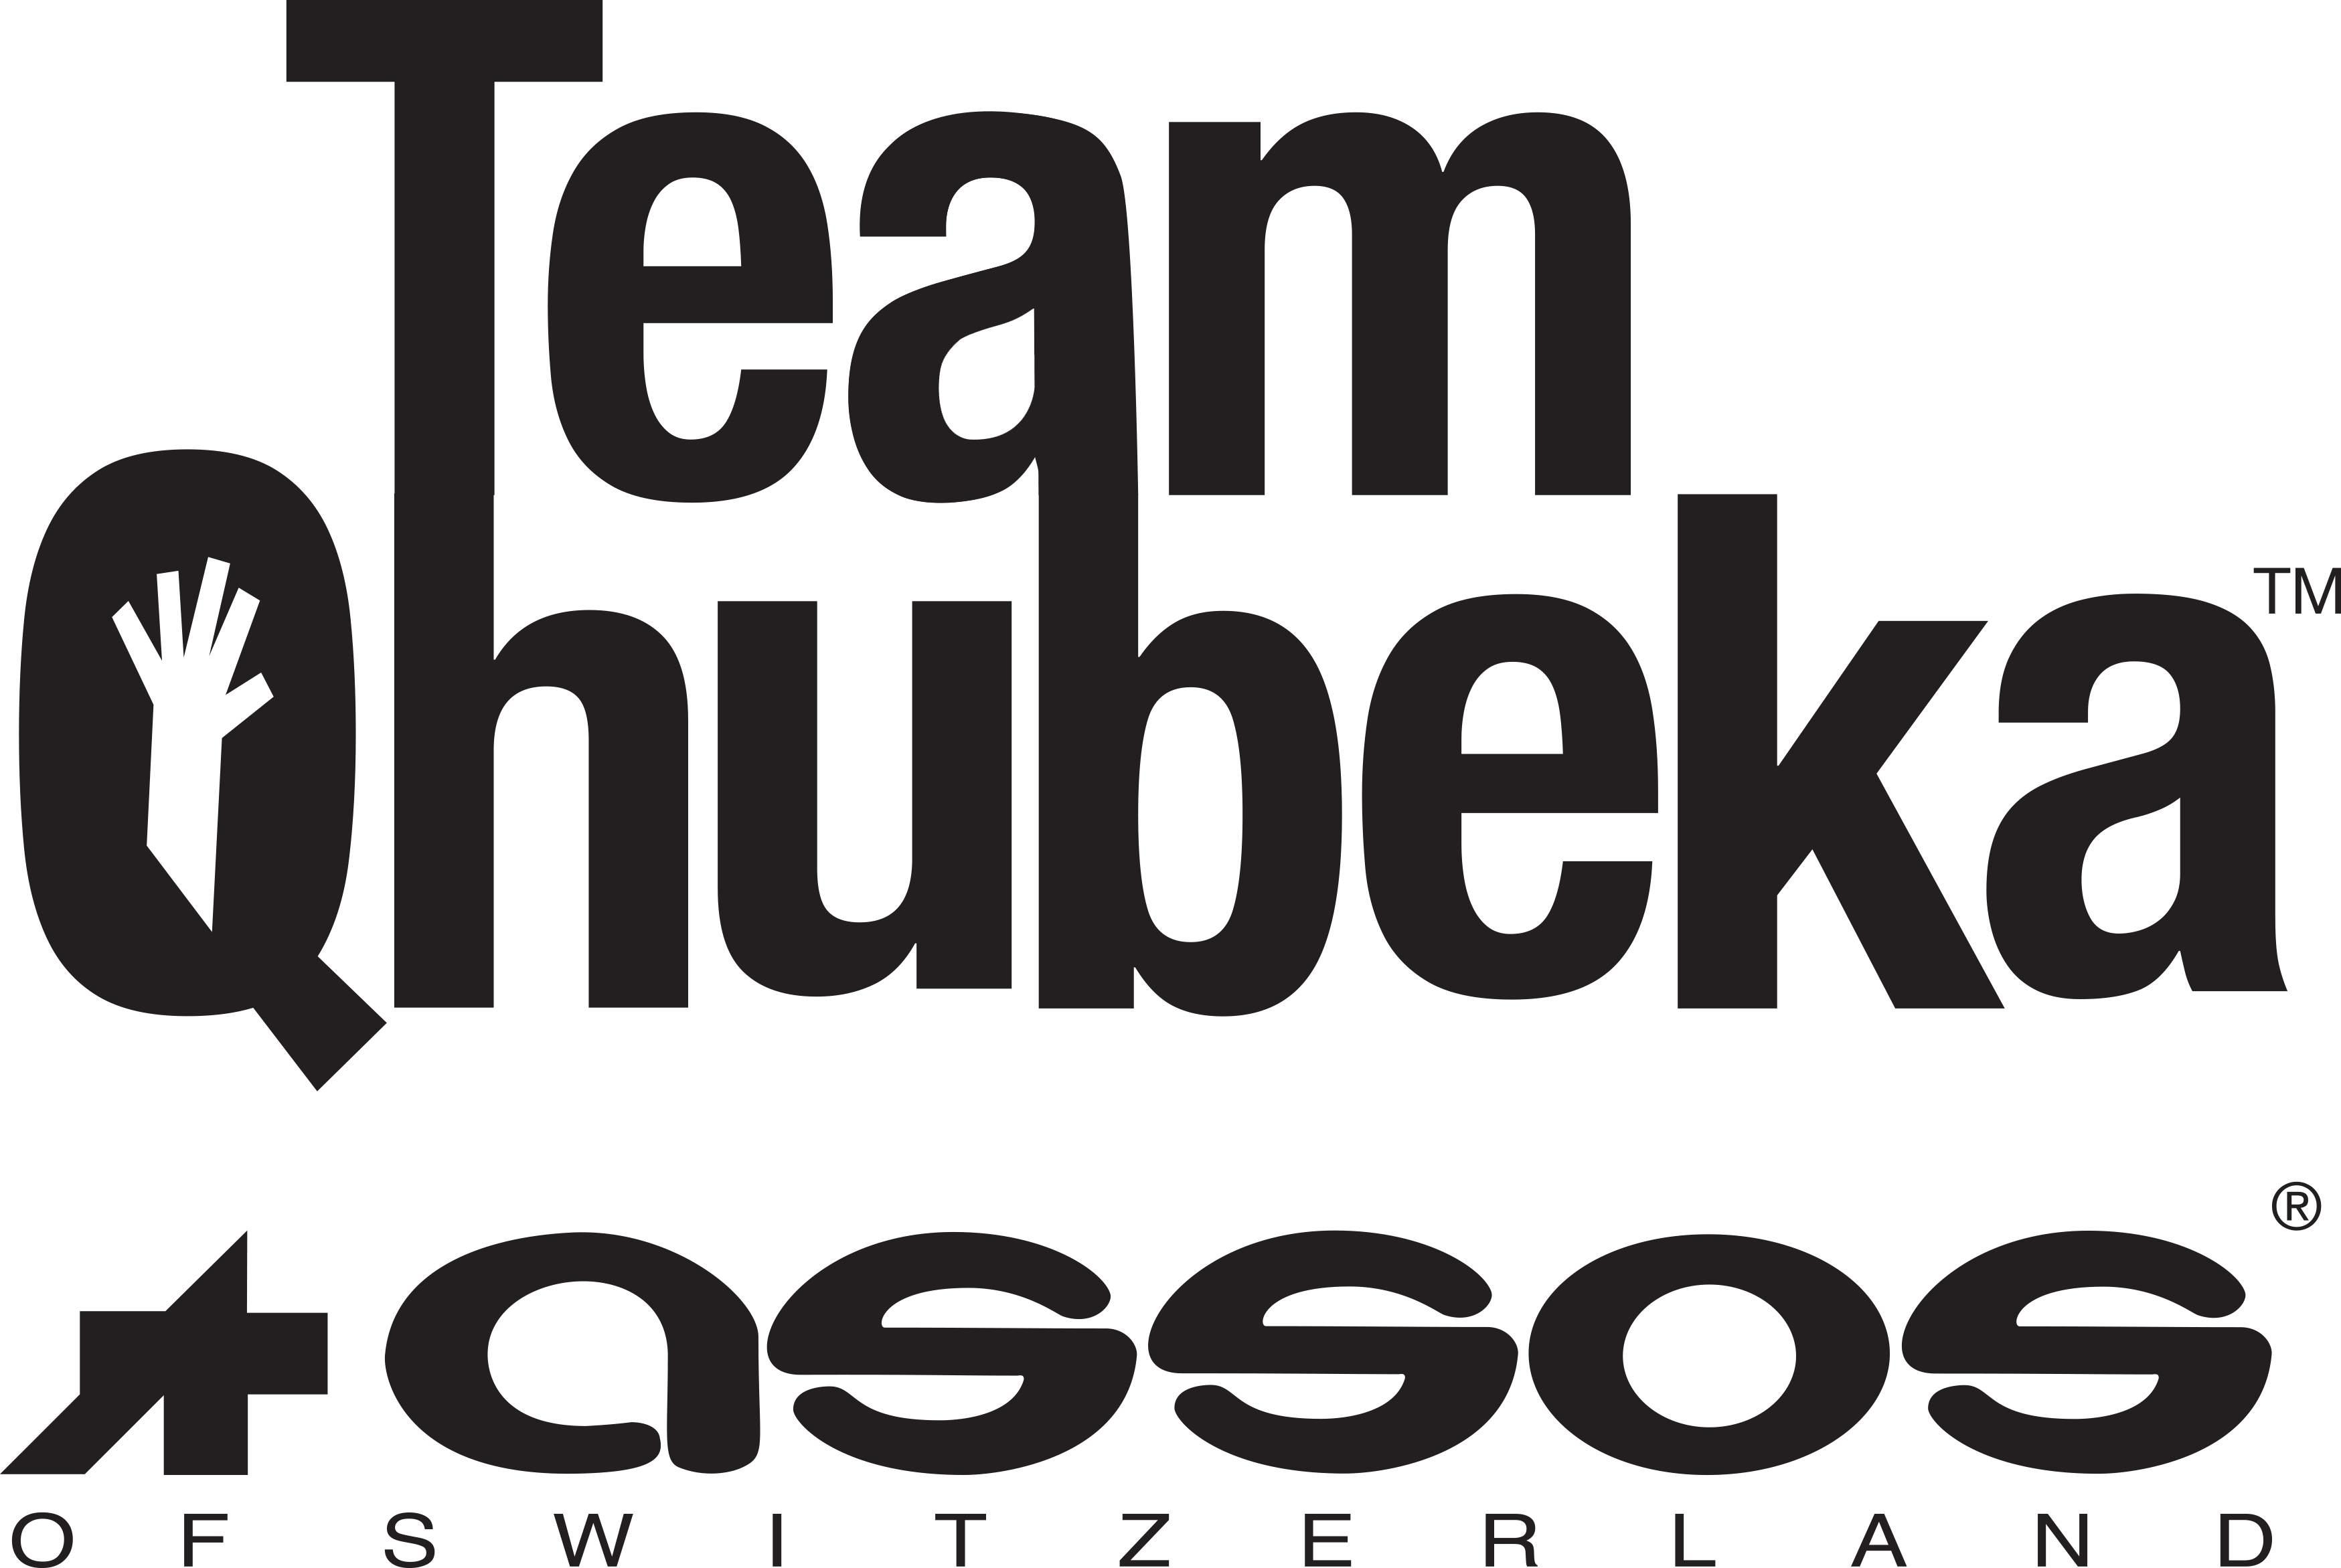 Ubuntu inspires Victor Campenaerts to sensational Giro d'Italia stage 15 victory